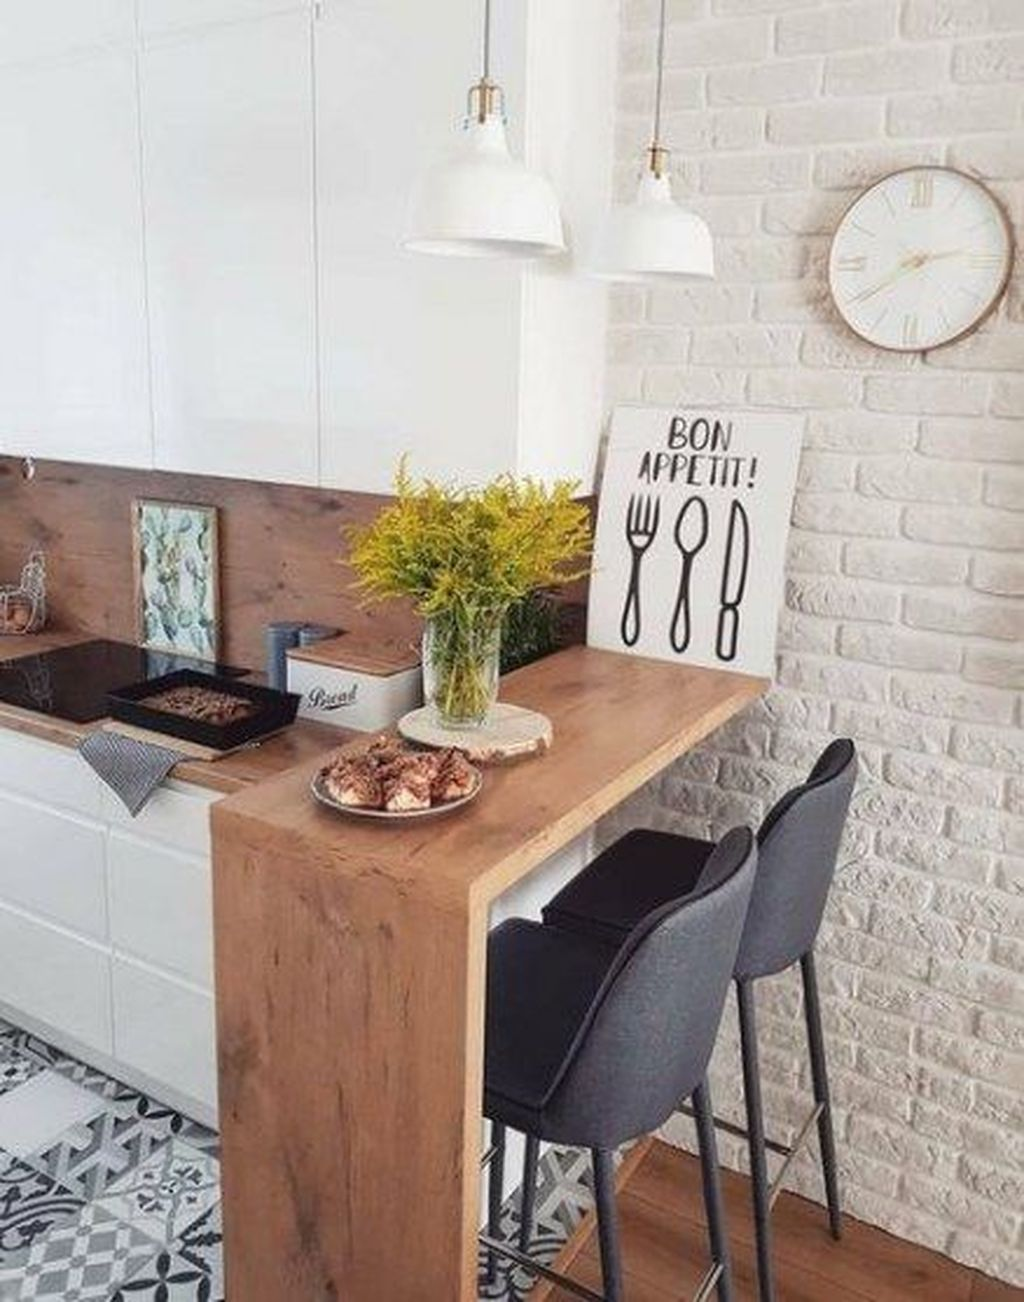 32 Popular Apartment Kitchen Design Ideas You Should Copy Pimphomee Very Small Kitchen Design Kitchen Design Kitchen Design Small